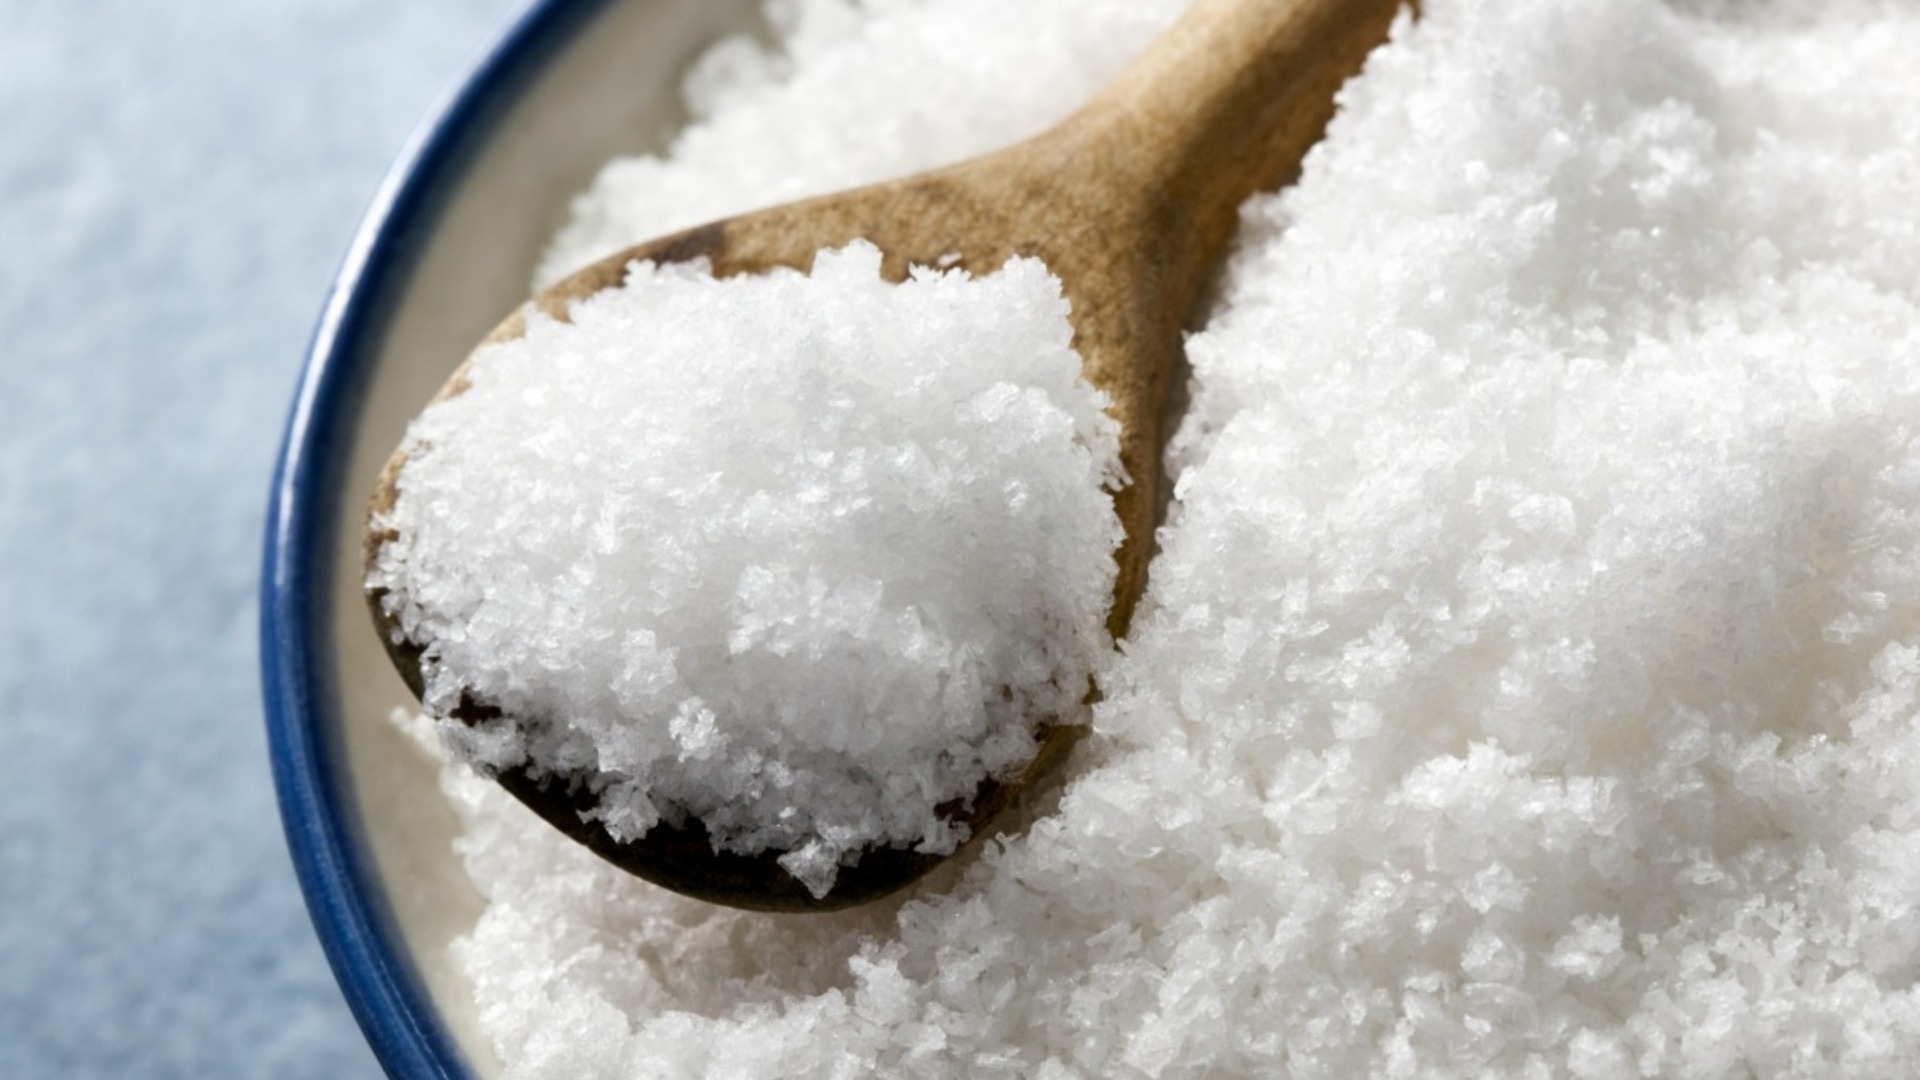 Ministerio de Salud manda a retirar 3 marcas de sal por no pasar normas sanitarias